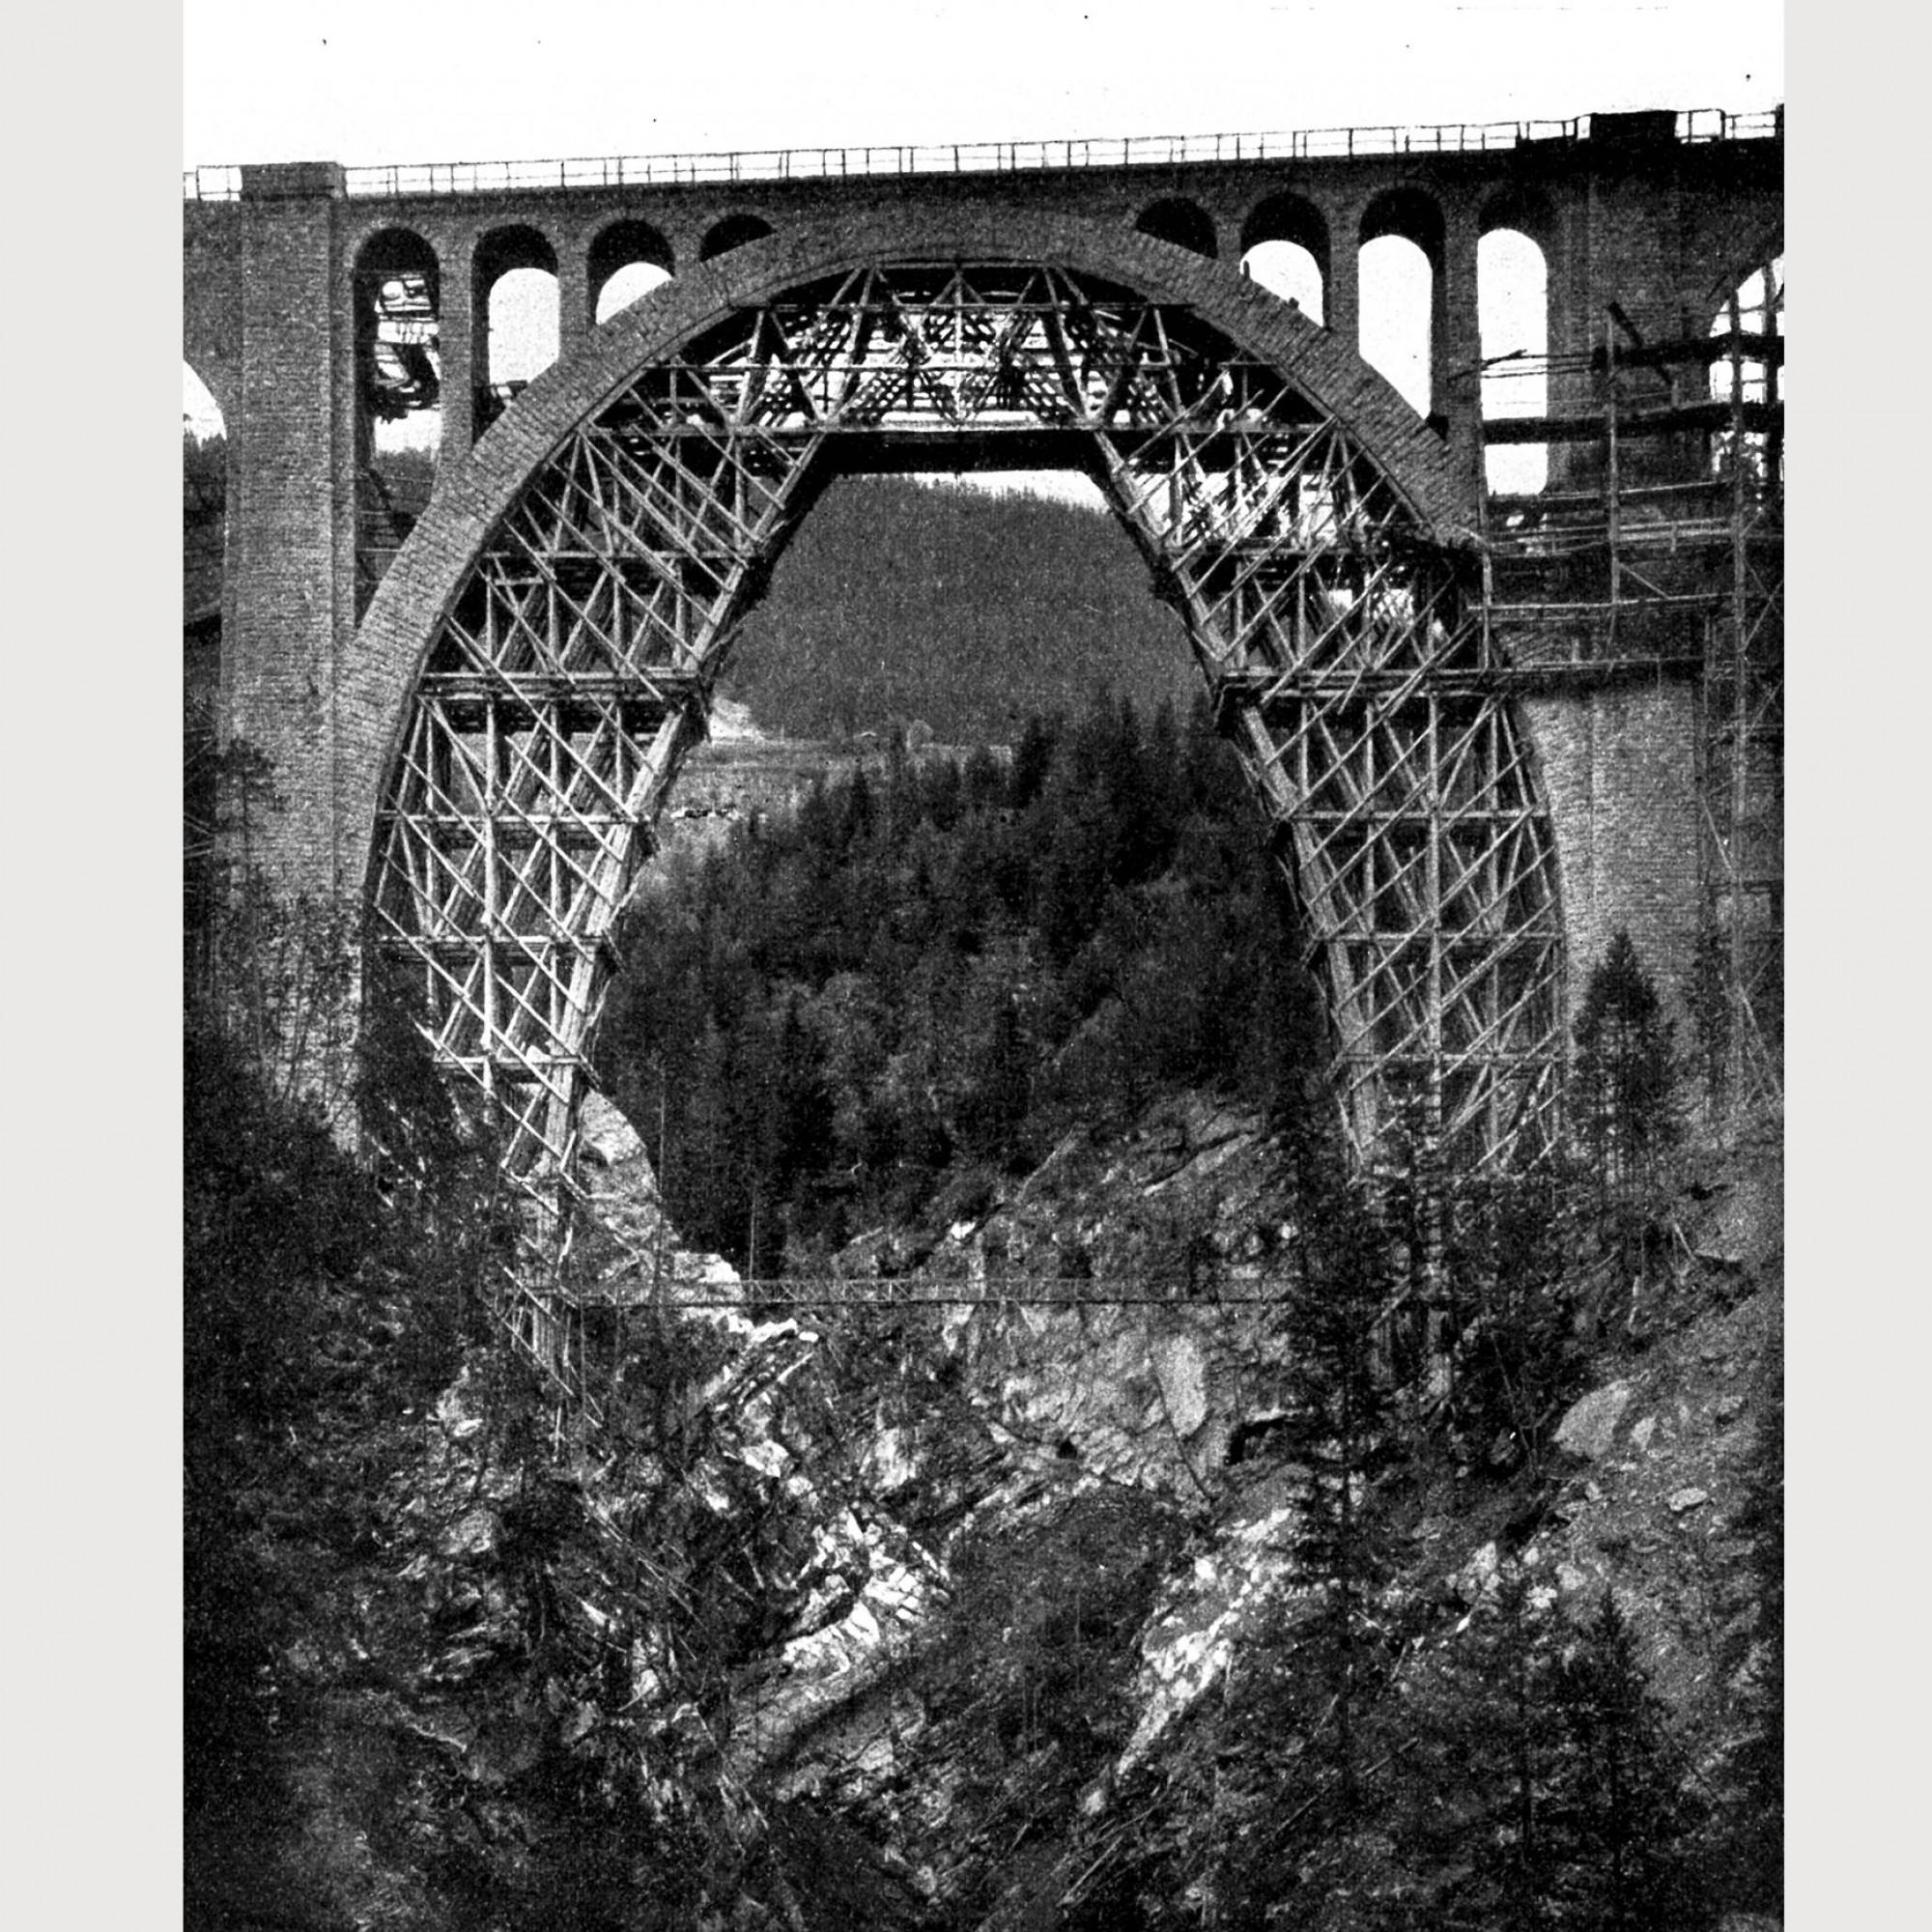 Lehrgerüst Wiesener Viadukt.